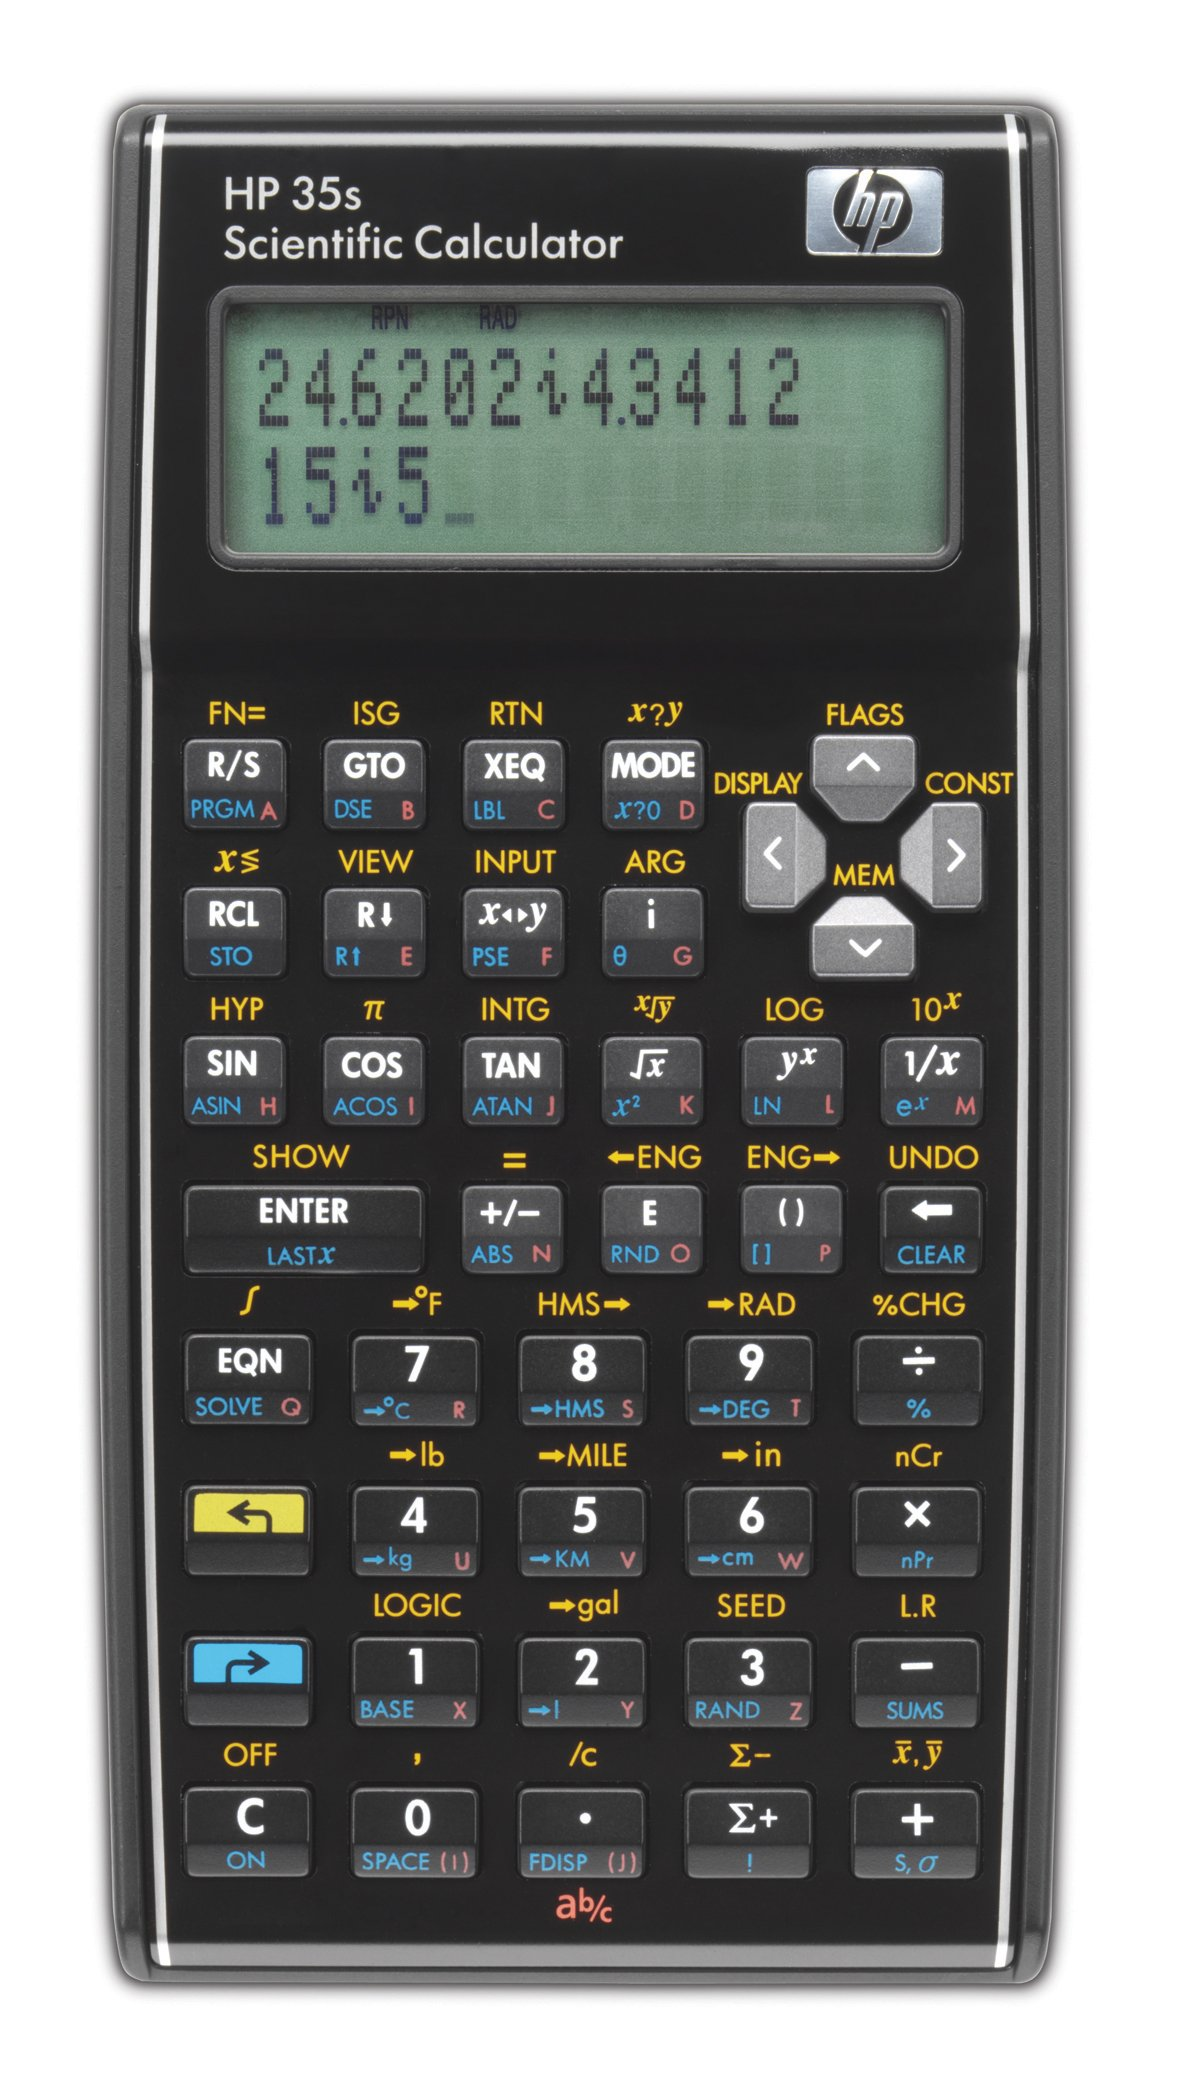 Hewlett Packard HP35S Scientific Calculator